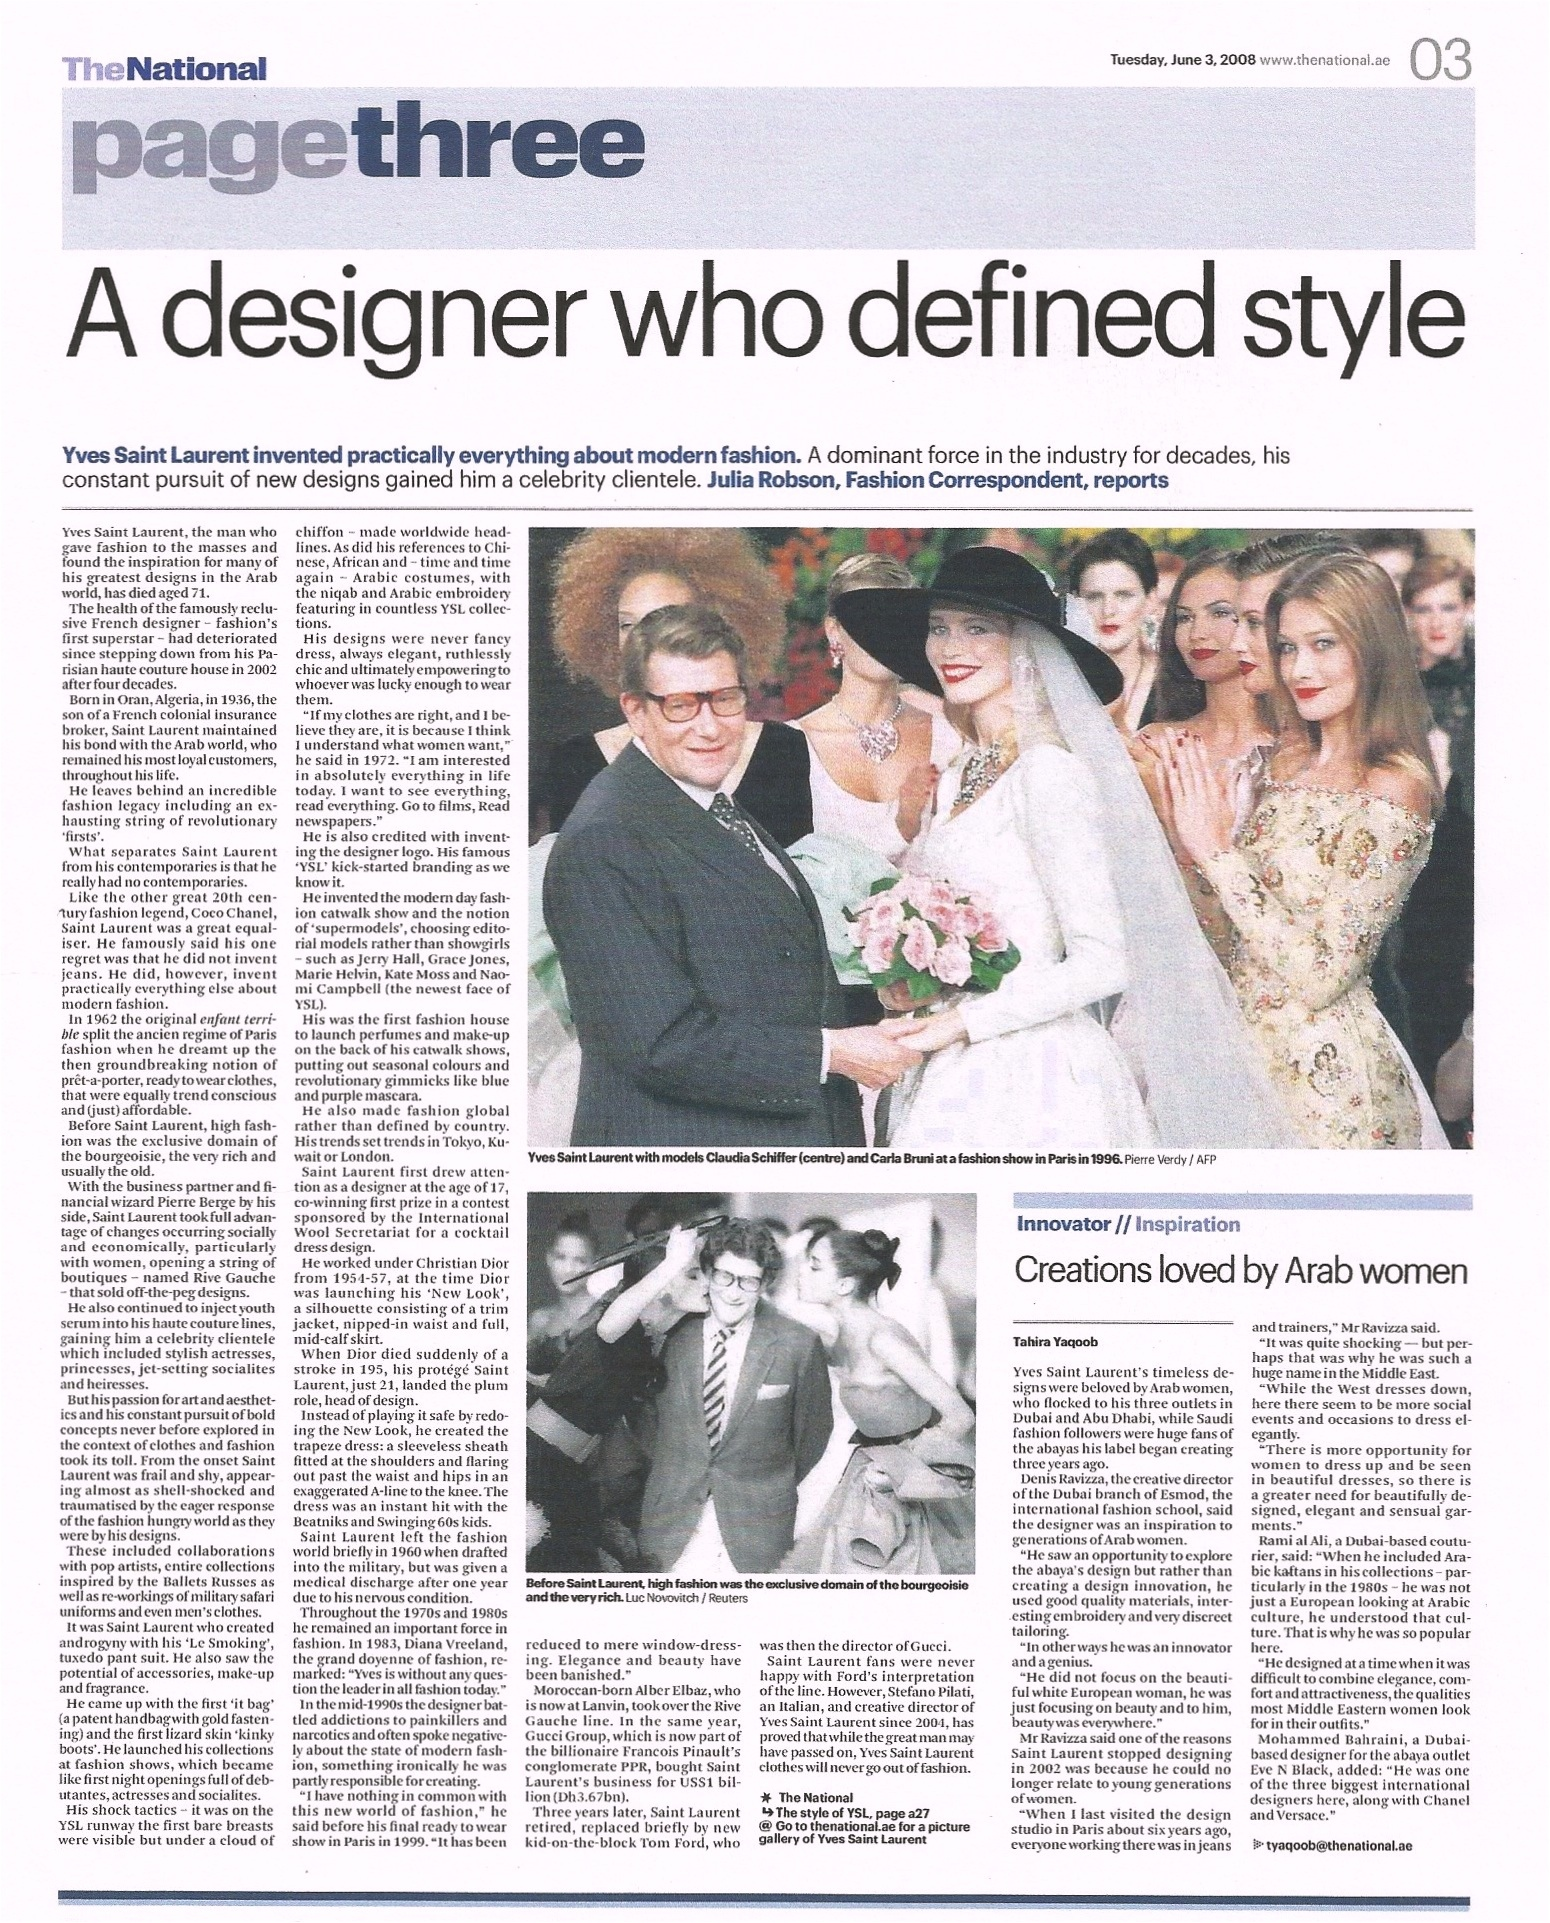 Julia-Robson-YSL-obituary-TheNational-June-2008